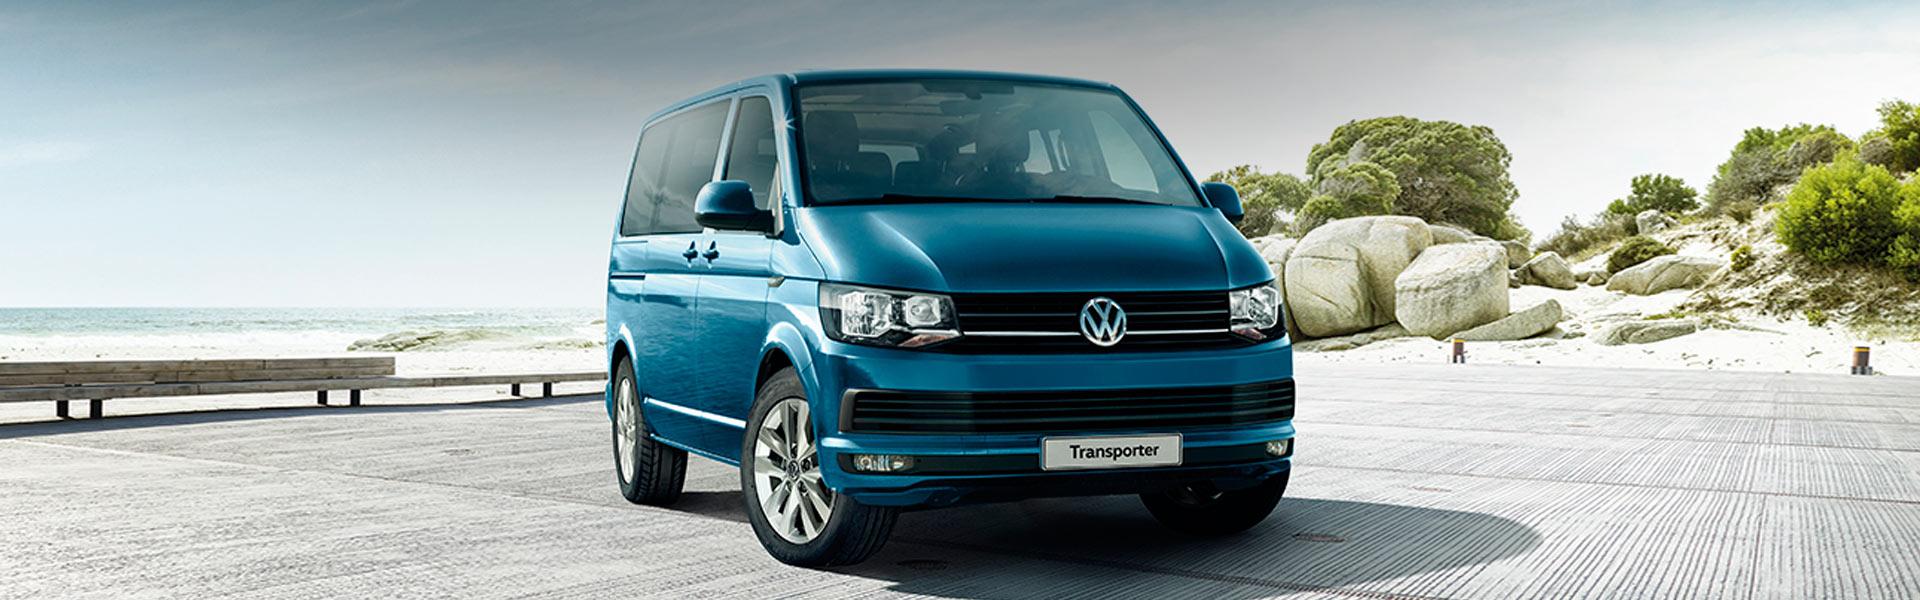 Запчасти на Volkswagen Transporter